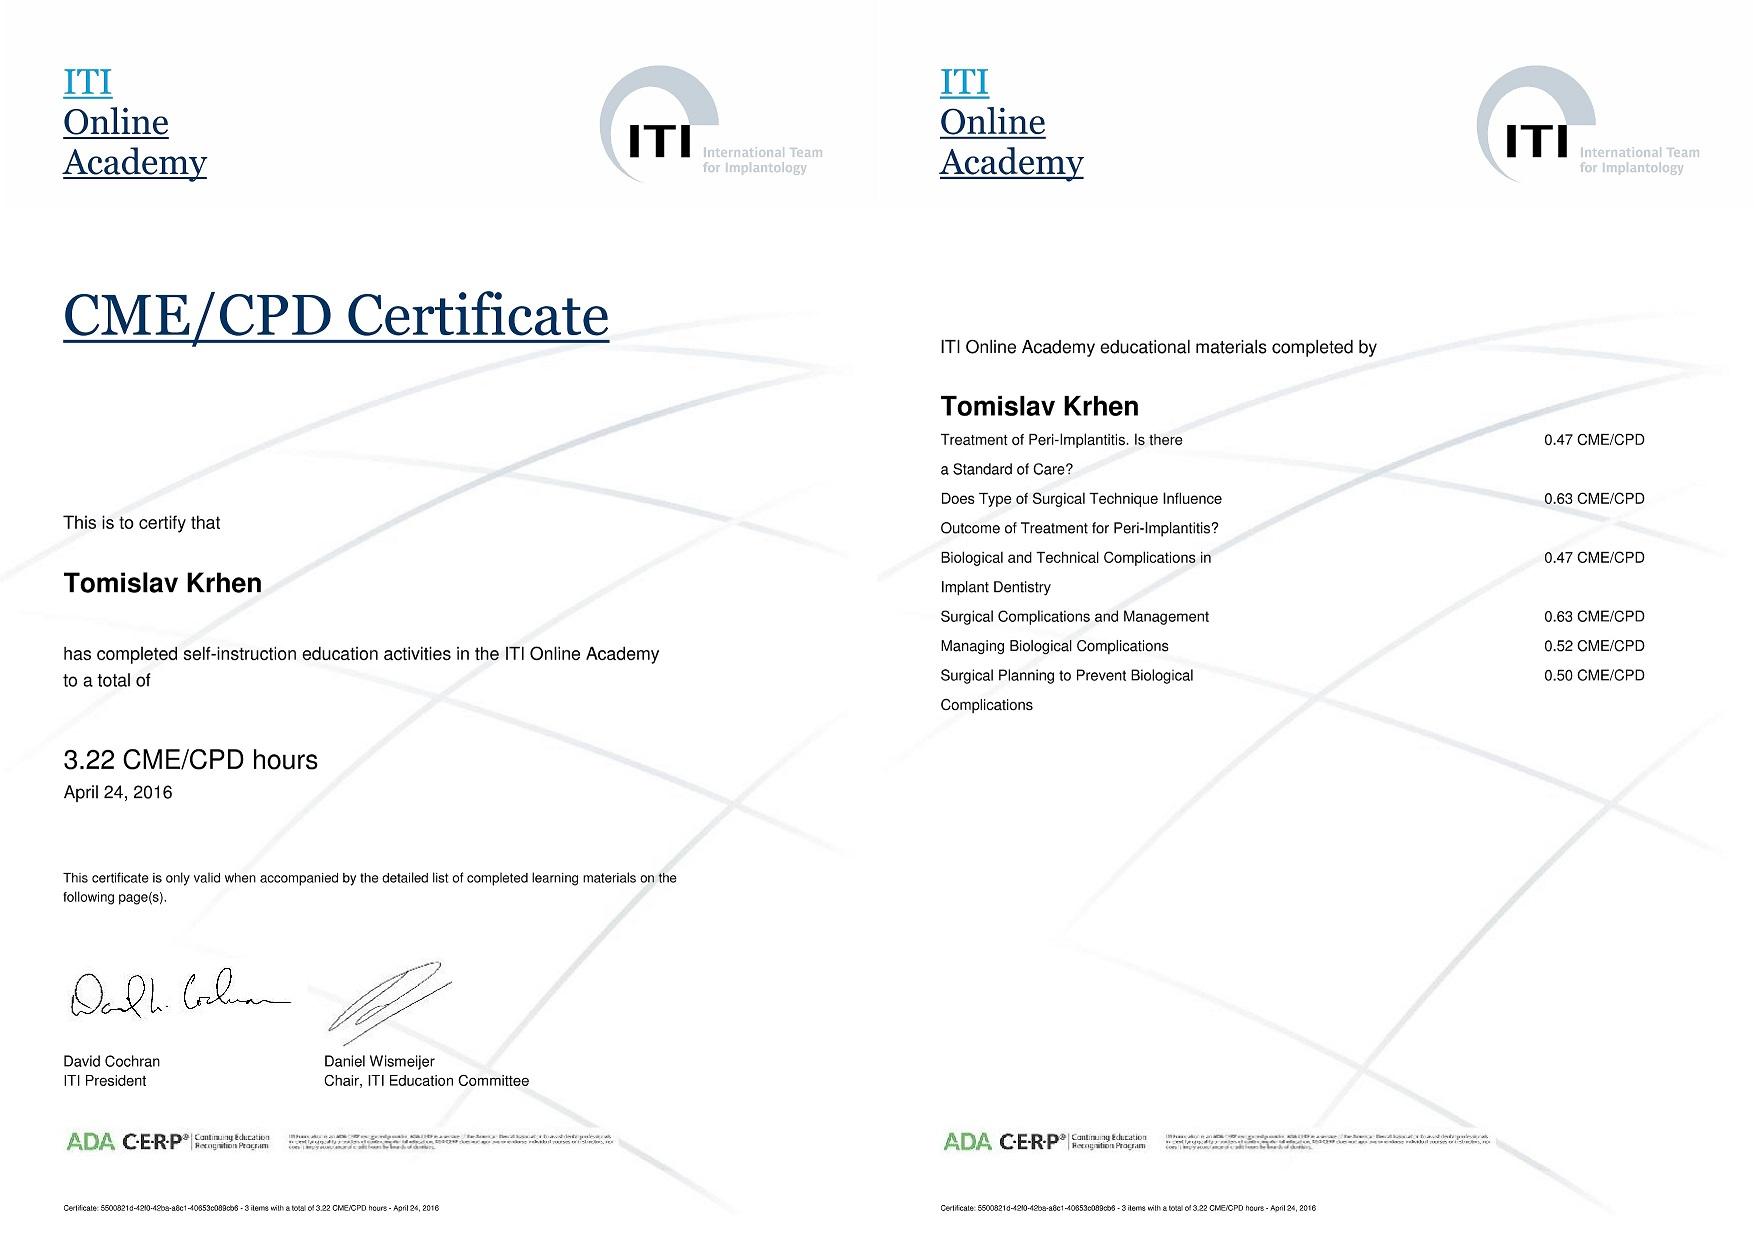 ITI-Online-Academy-Periimplantitis